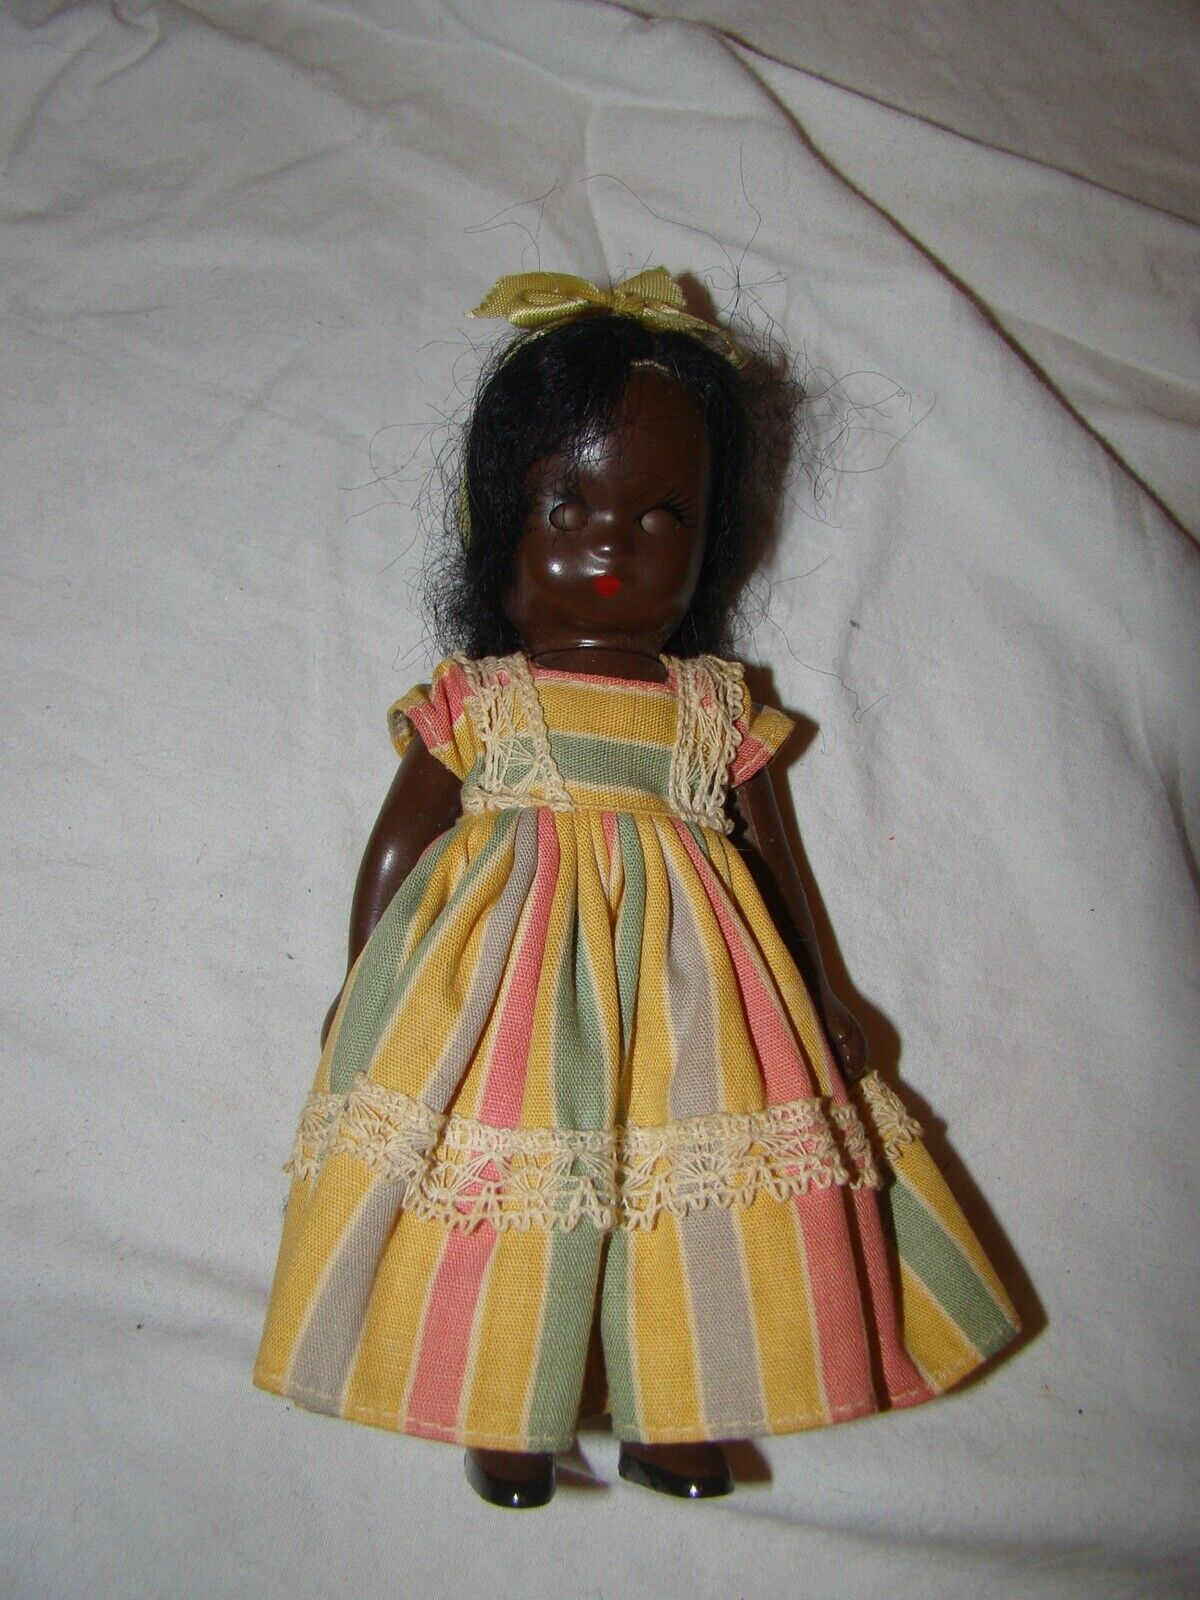 Original Nancy Ann Story Book Dolls - Topsy - $65.00